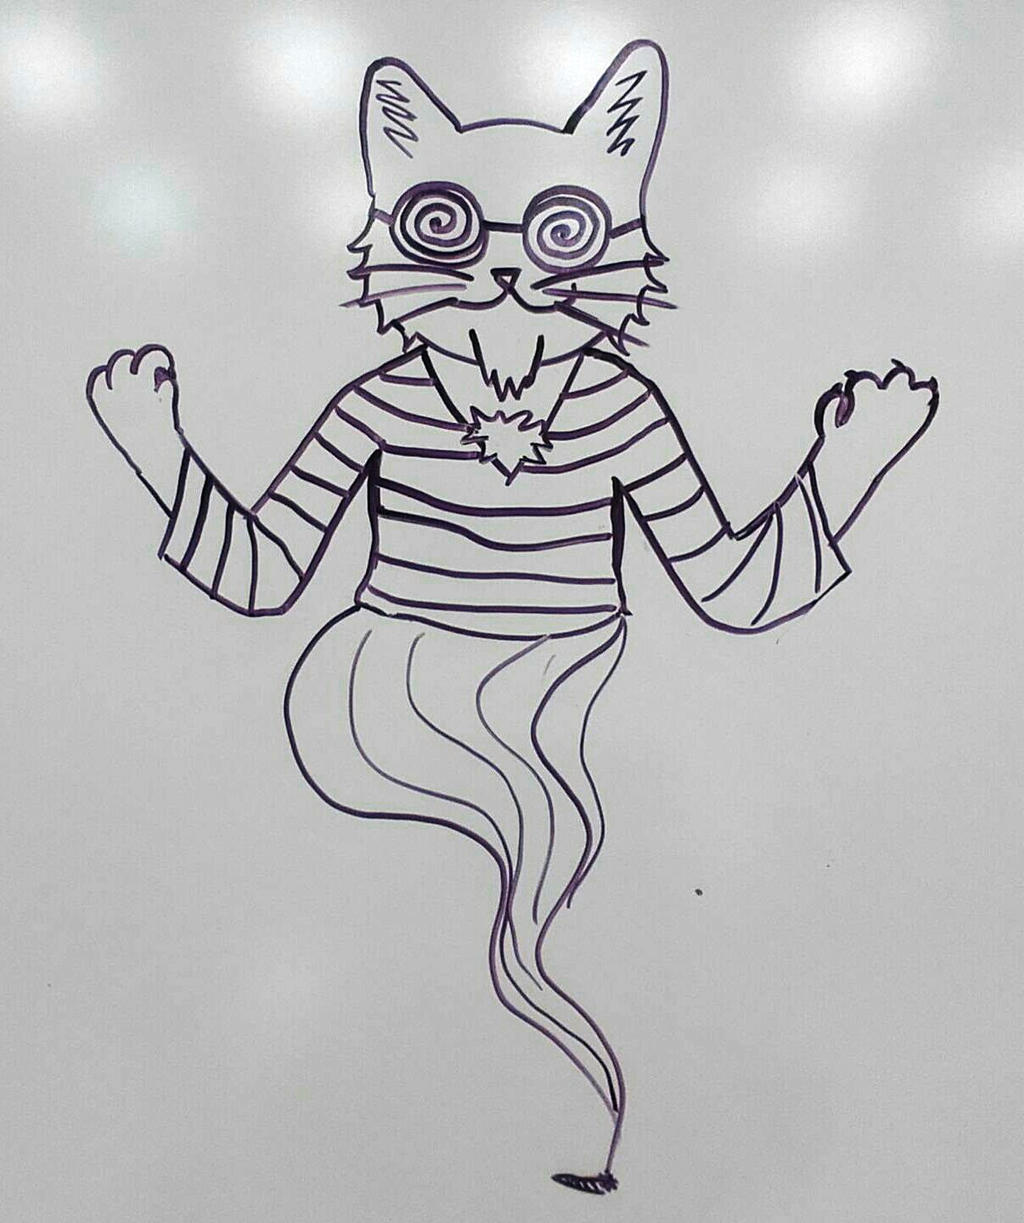 Whiteboard Doodle #3  by Takis-sama